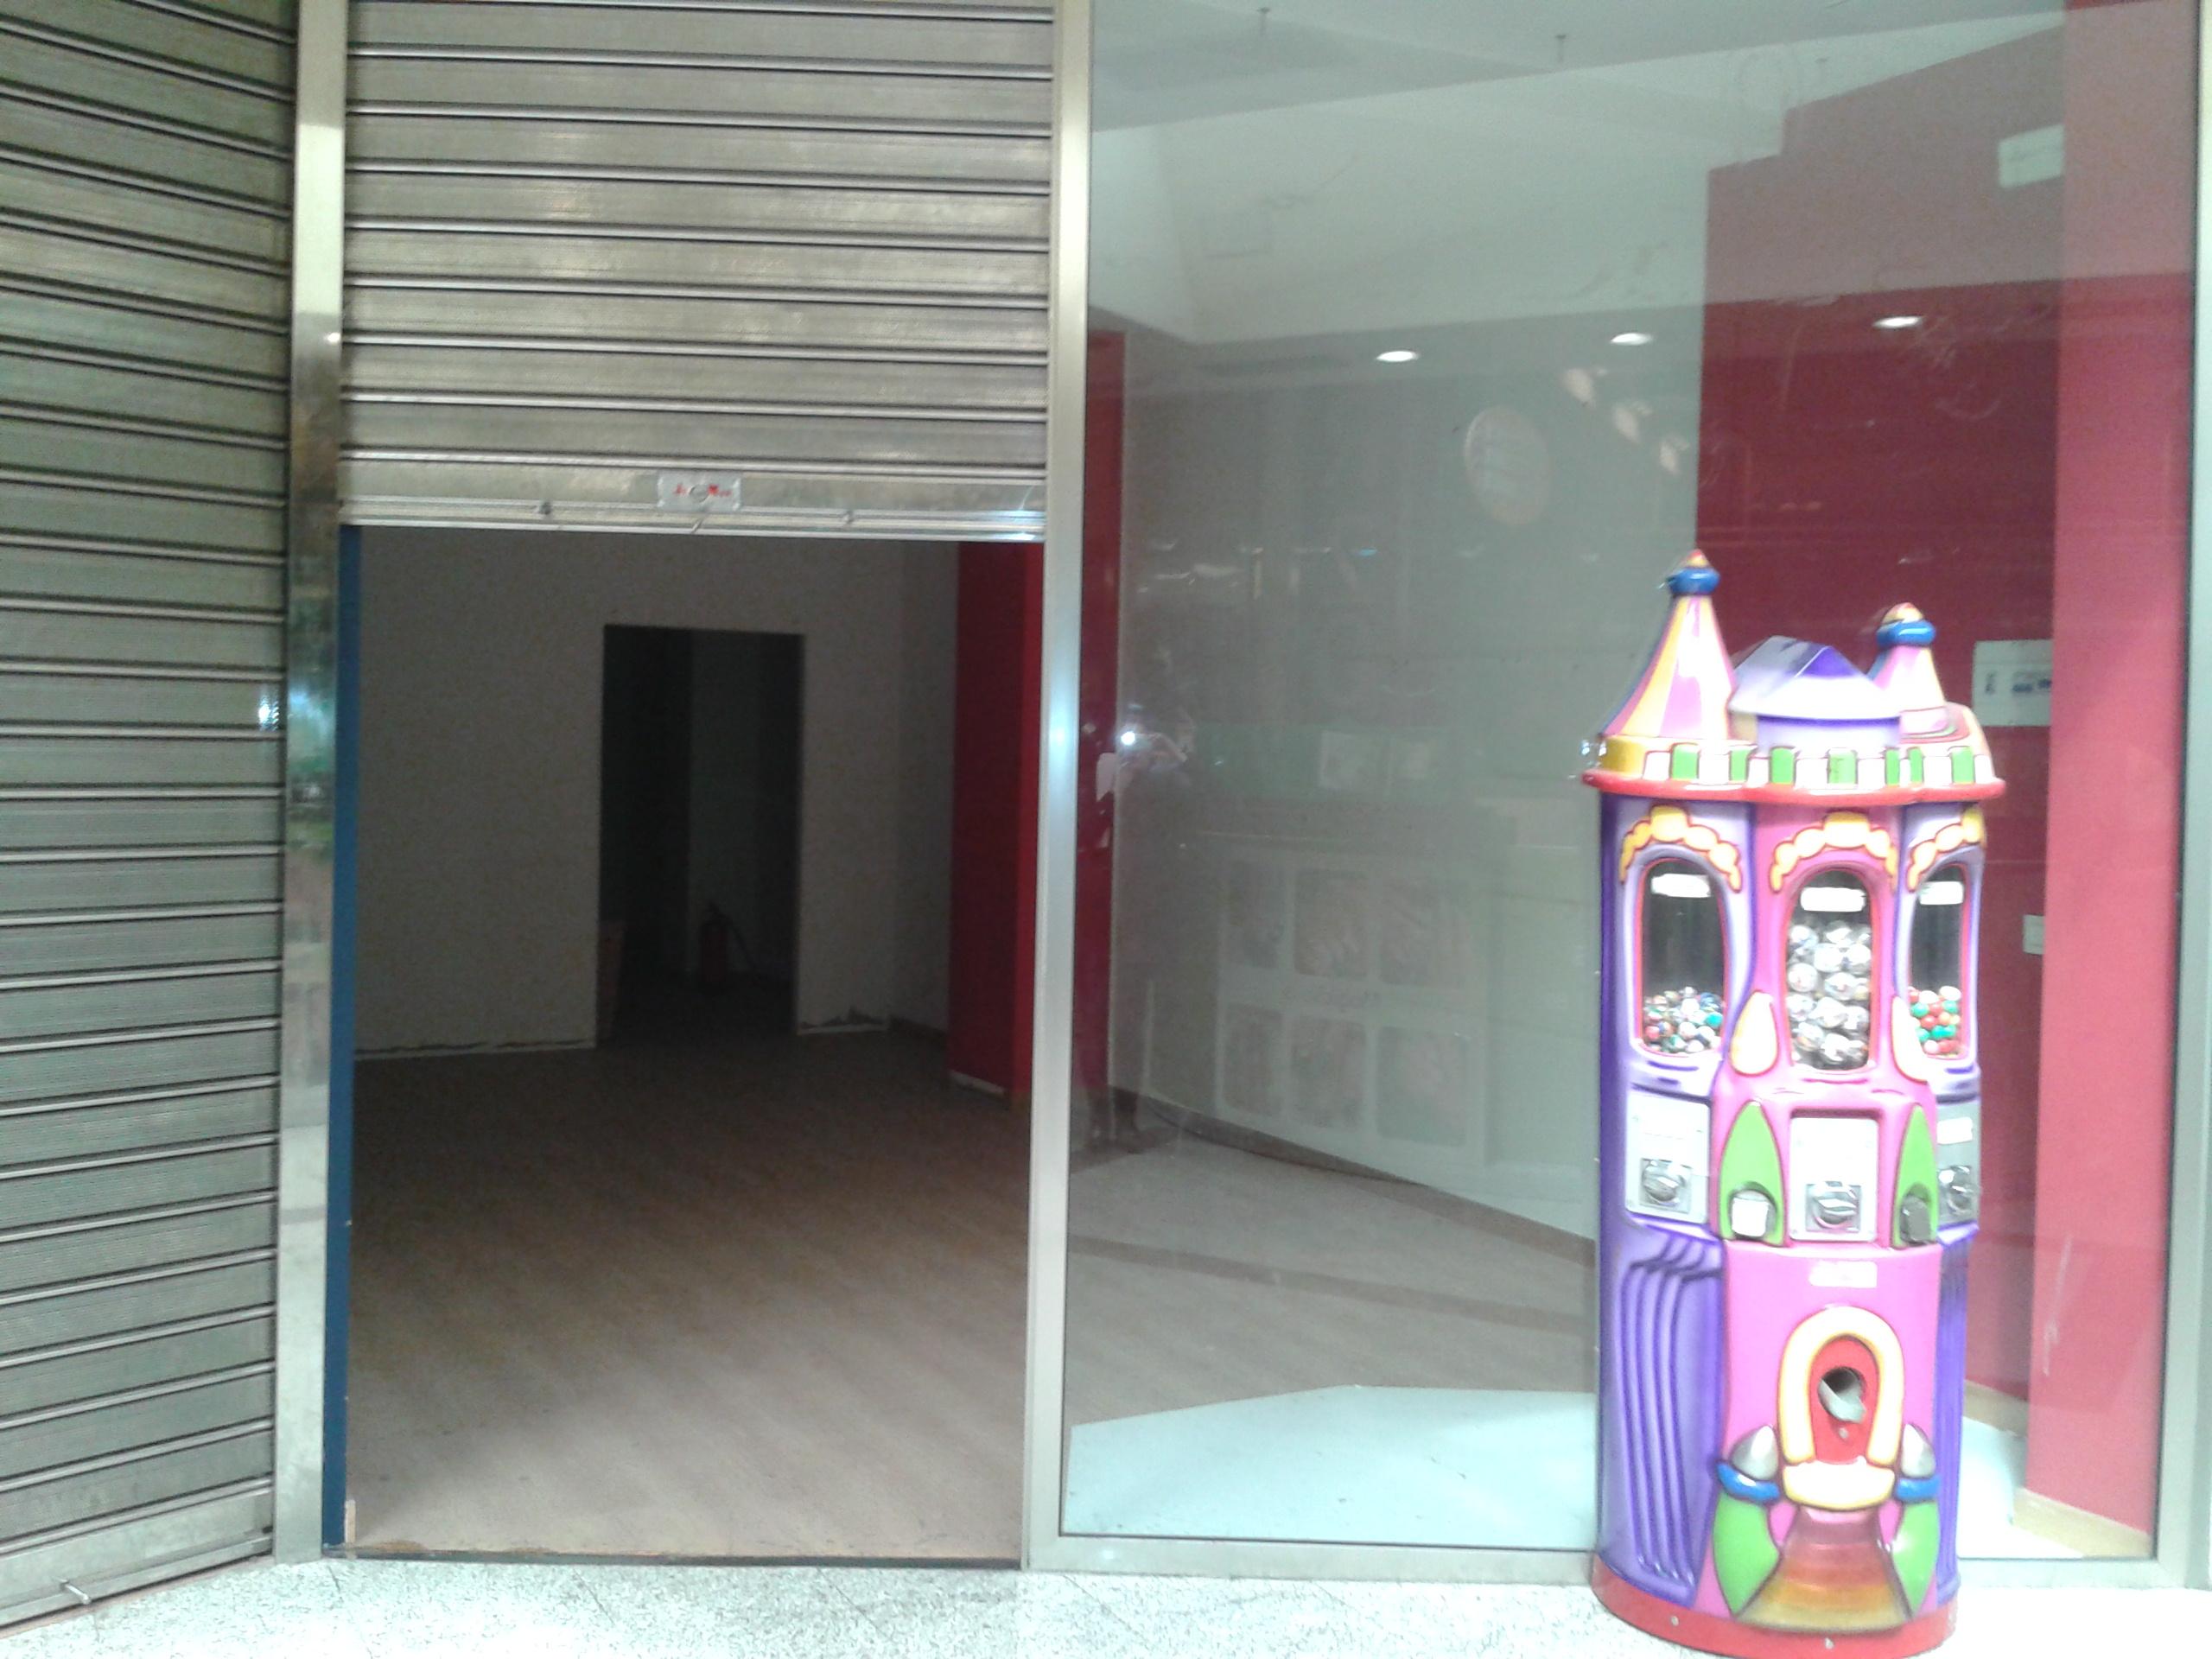 Local en venta en A Ramallosa, Nigrán, Pontevedra, Calle Manuel Lemos, 35.100 €, 53 m2